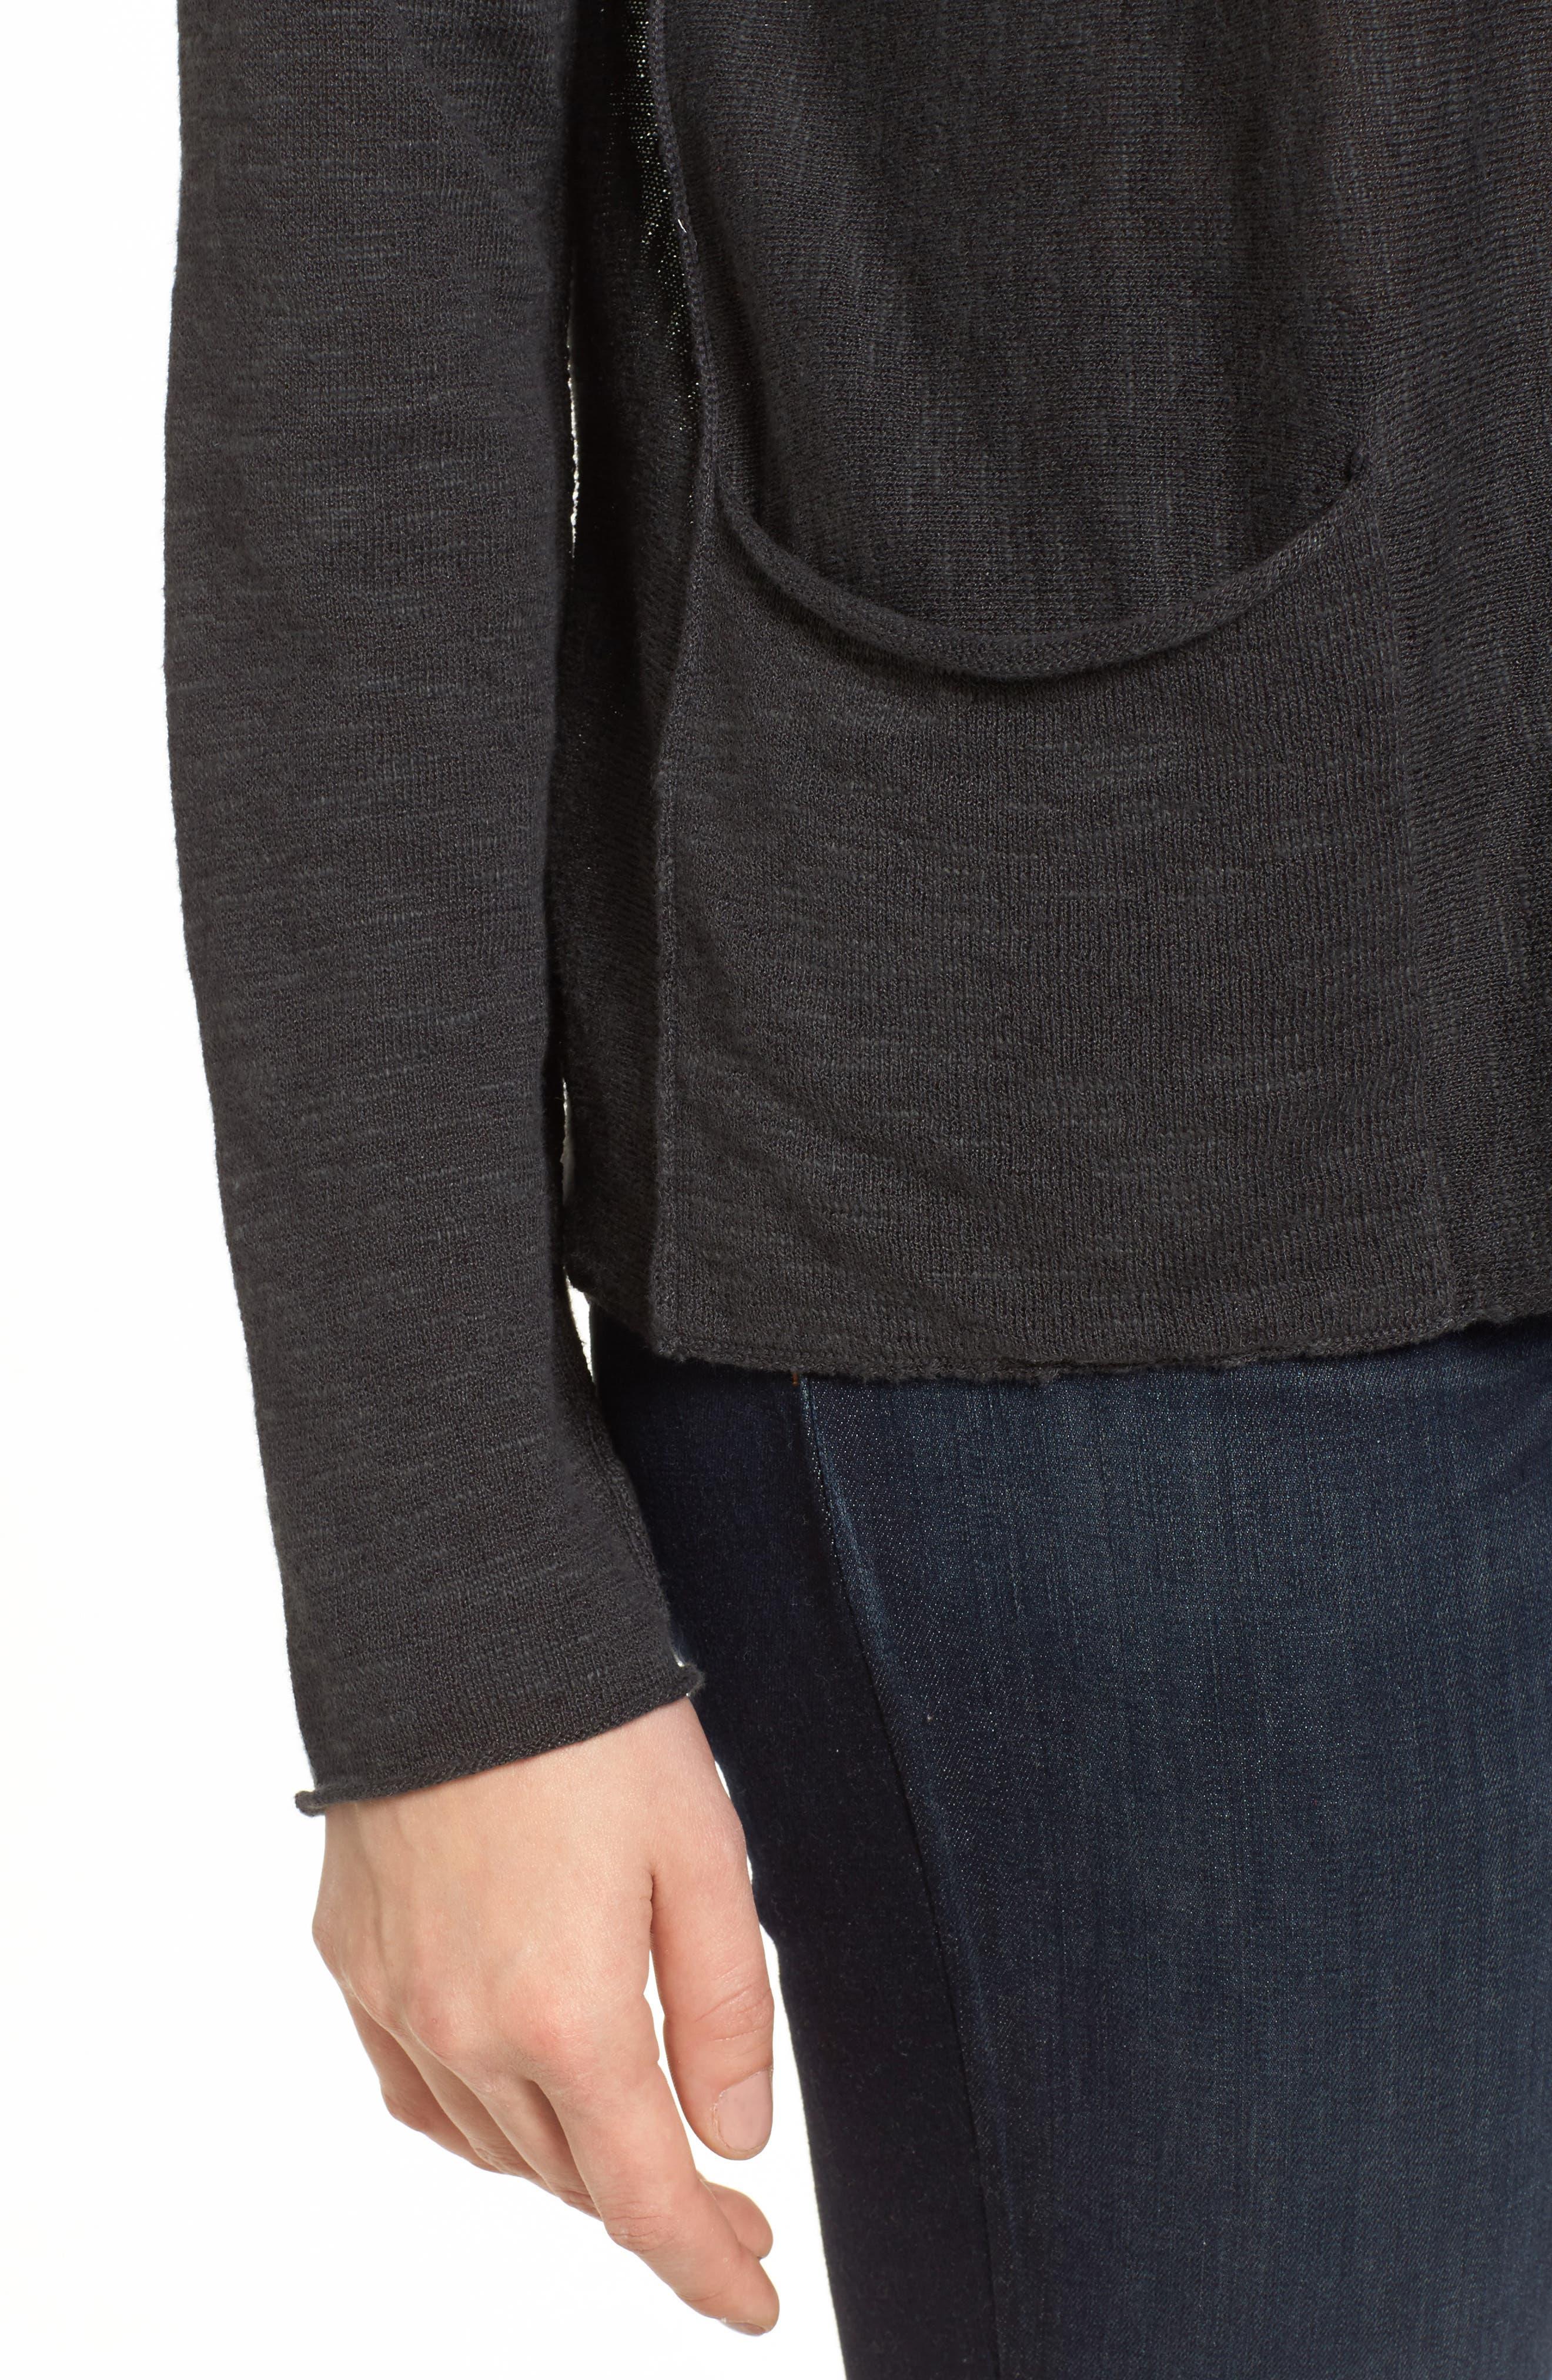 Organic Linen & Cotton Knit Boxy Top,                             Alternate thumbnail 4, color,                             021